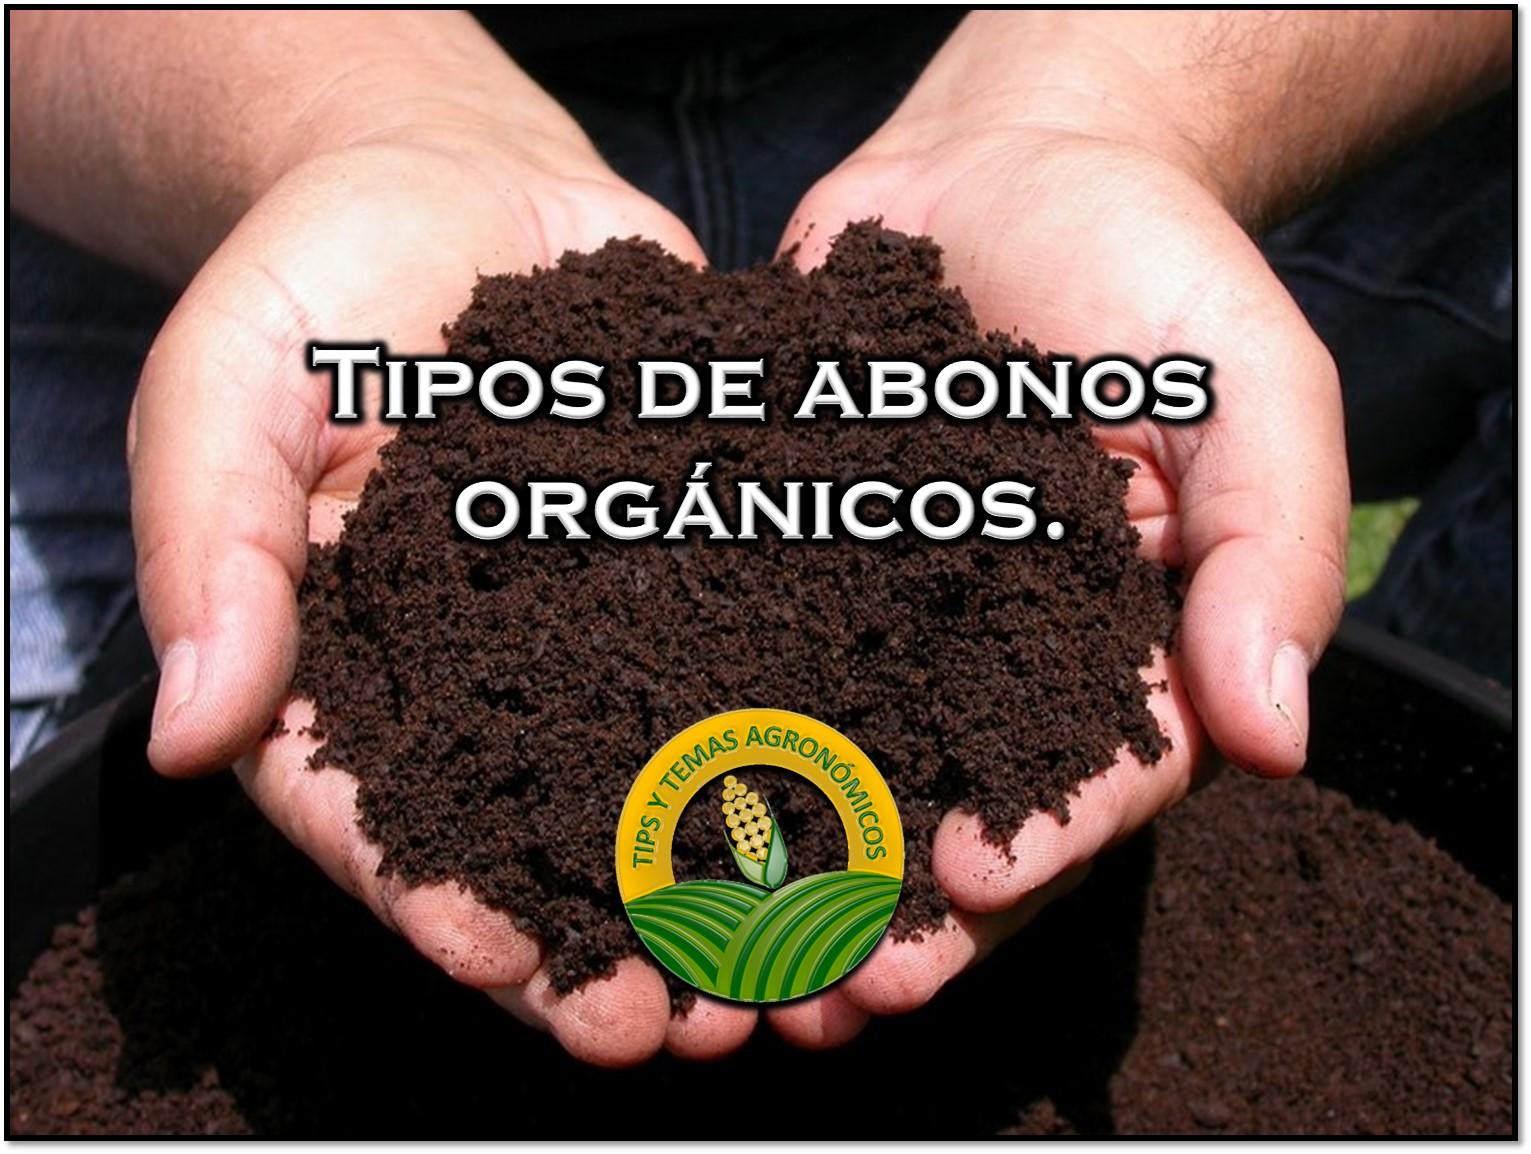 tipos de abonos orgnicos - Abono Organico